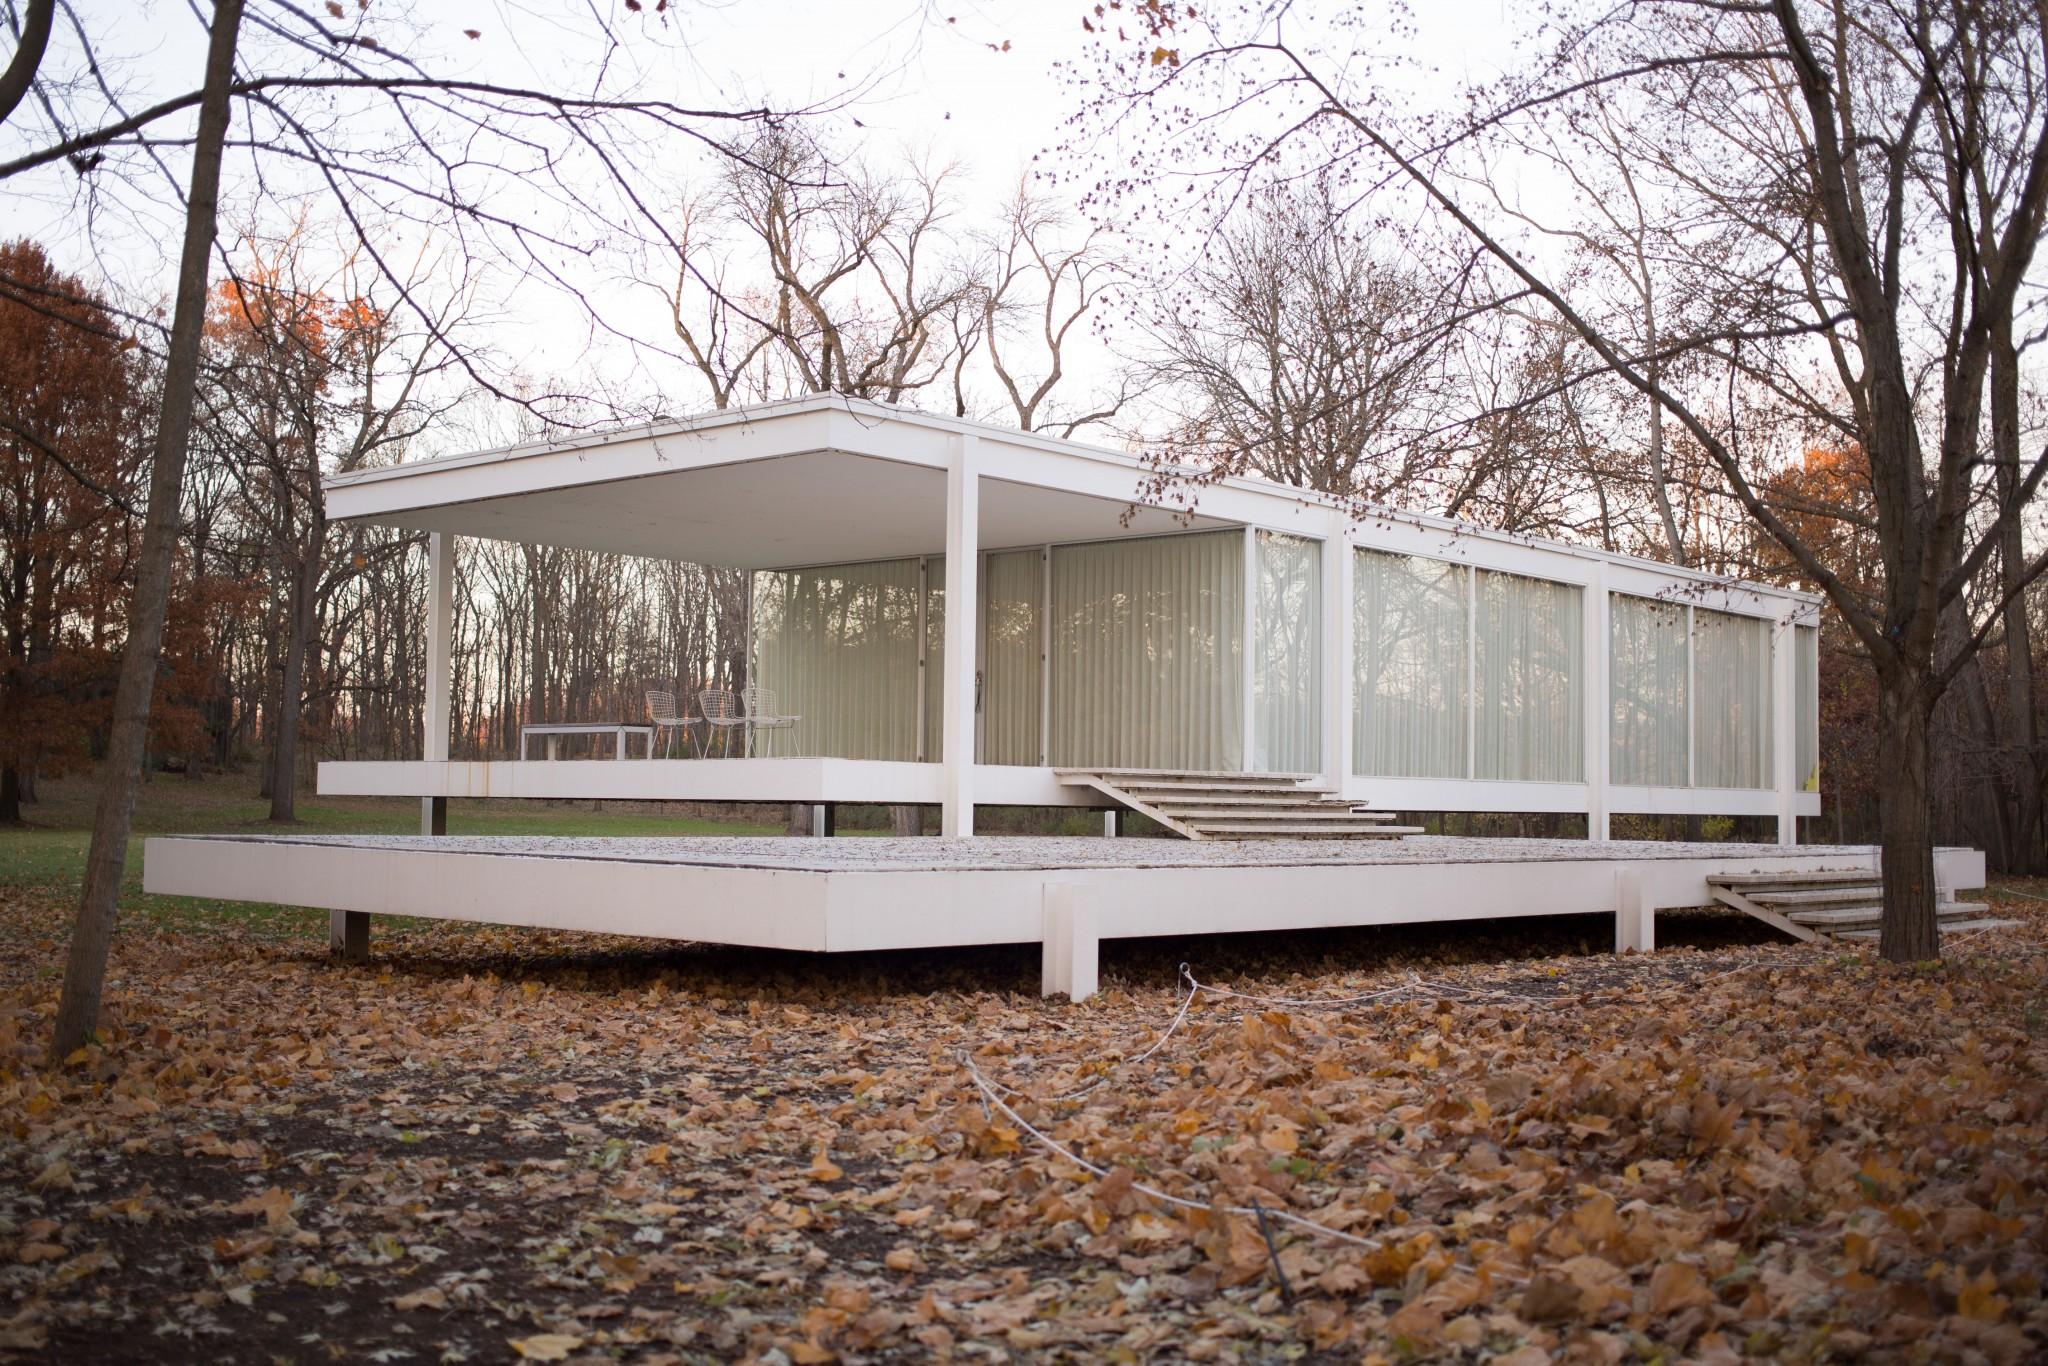 Mies van der Rohe European Modernist Designer in America